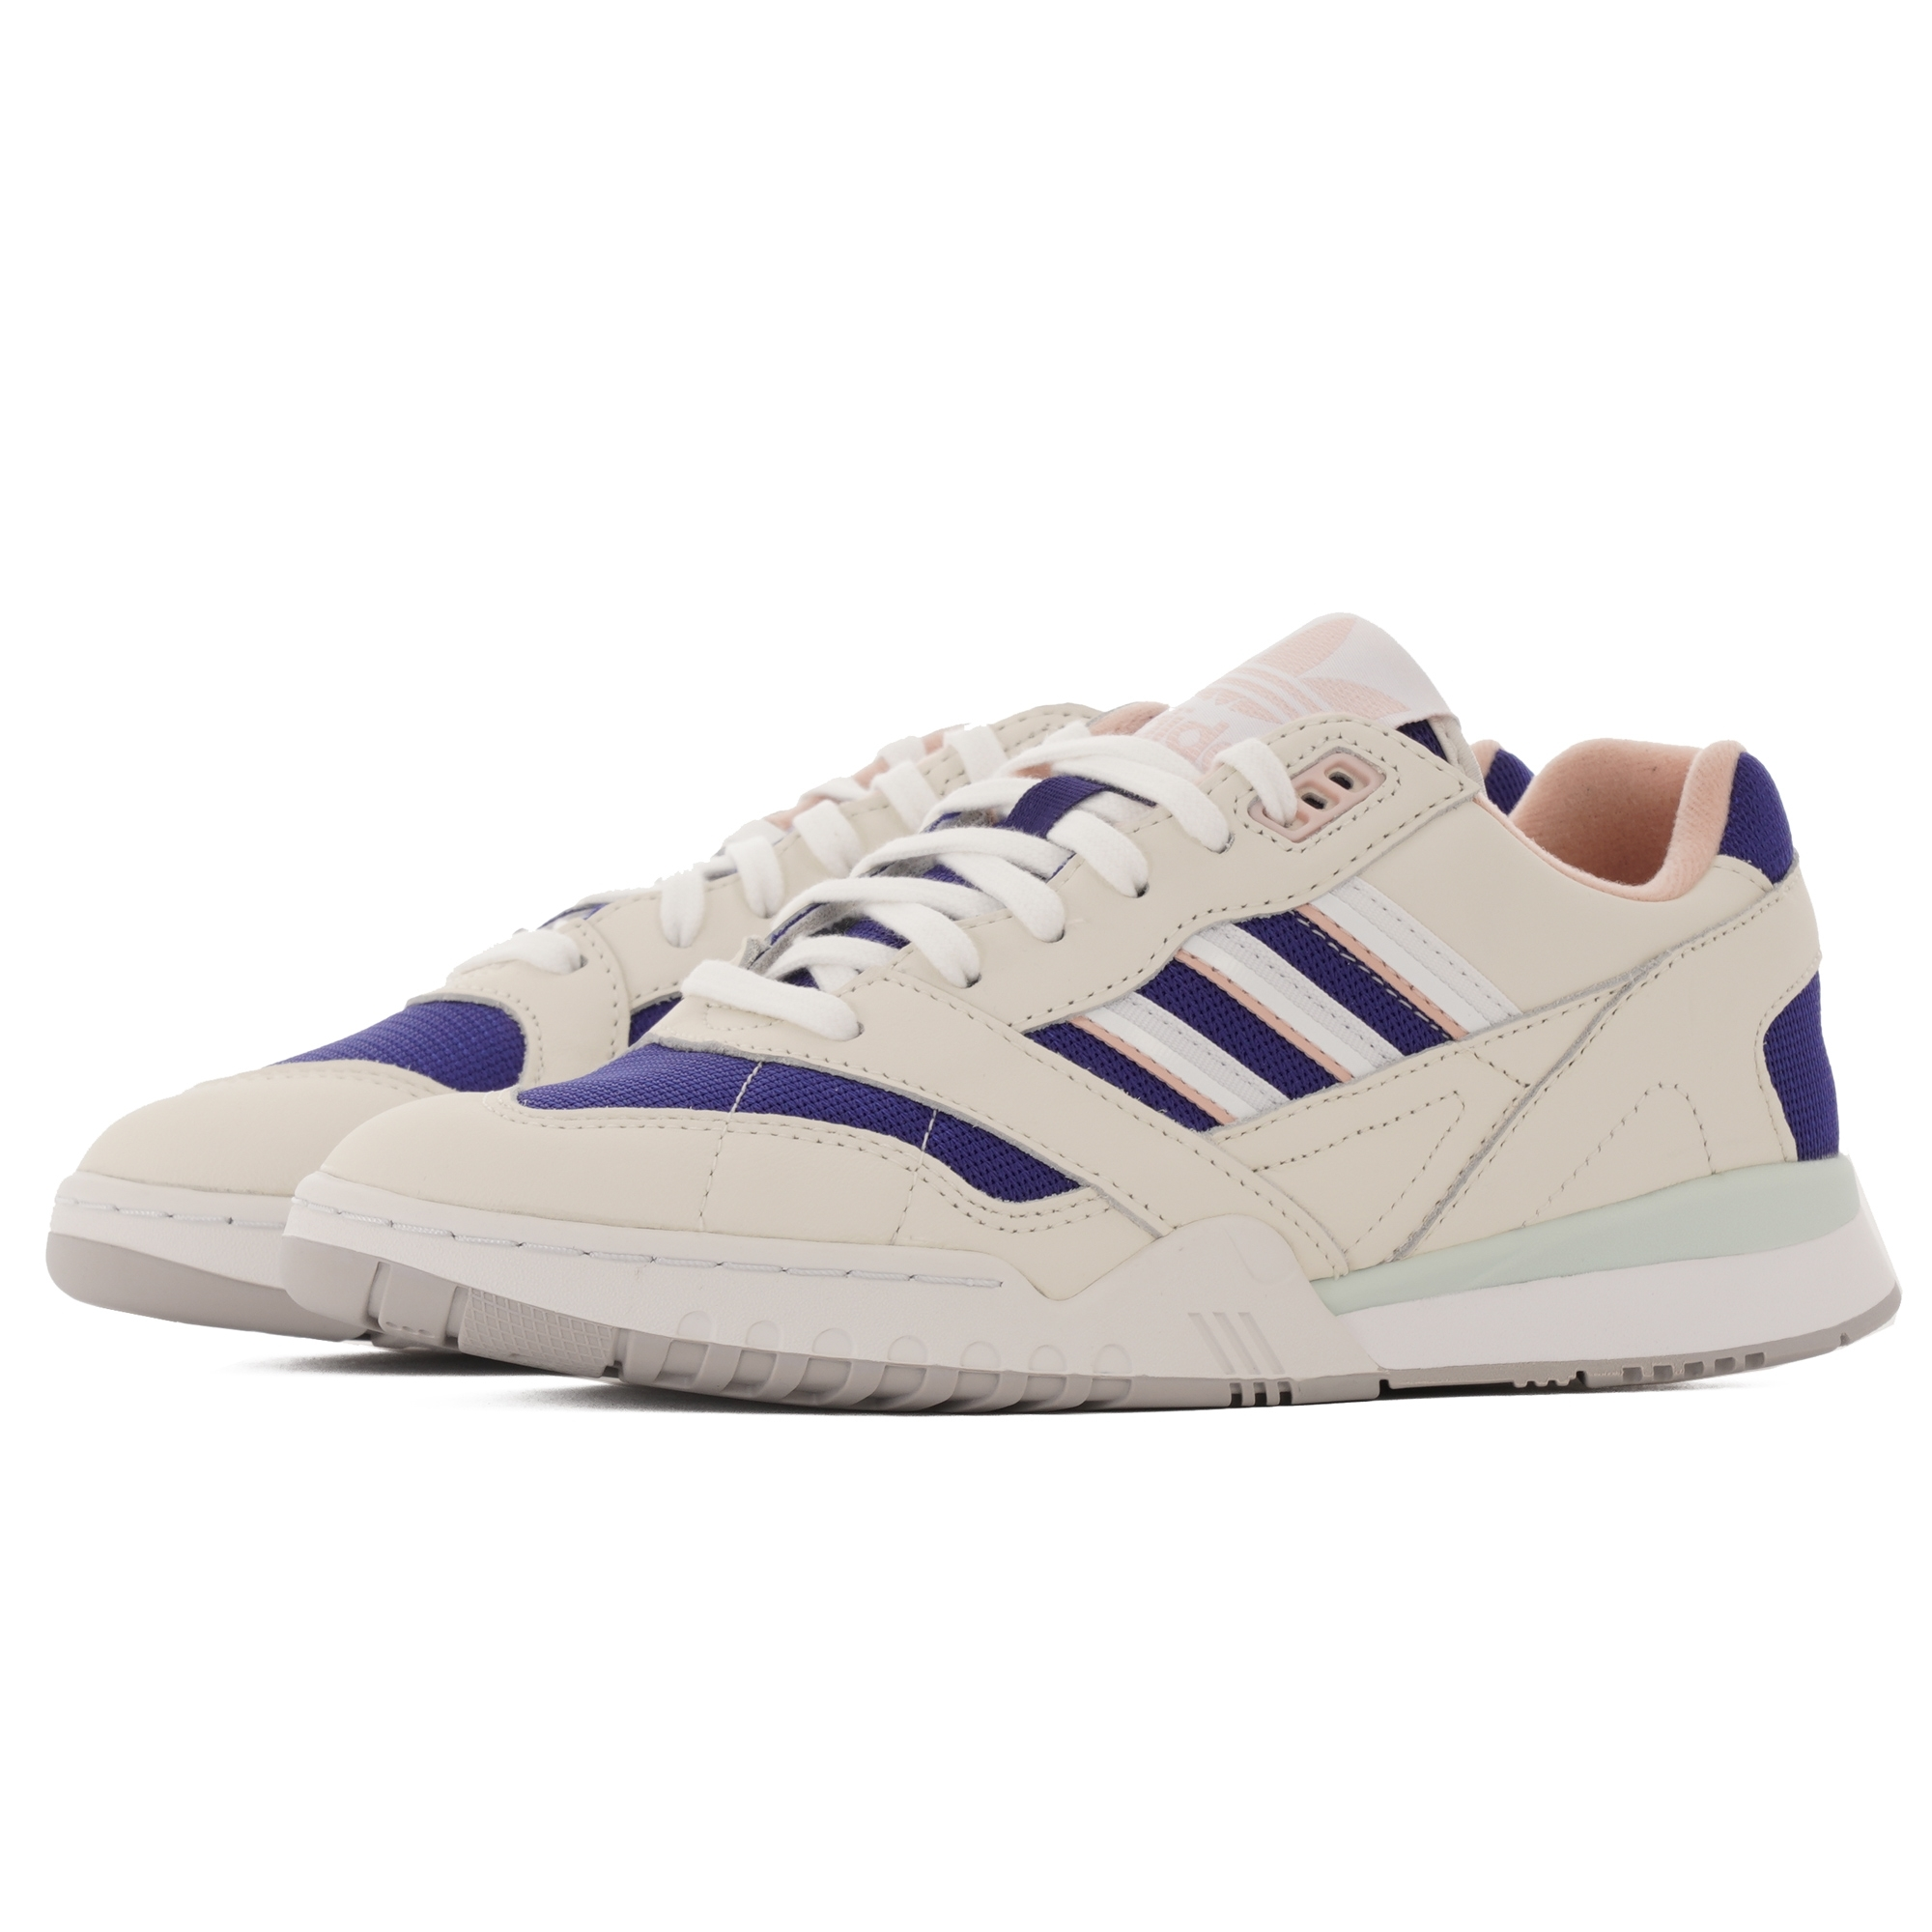 Adidas A.R. Trainer Cloud White Raw White Off White